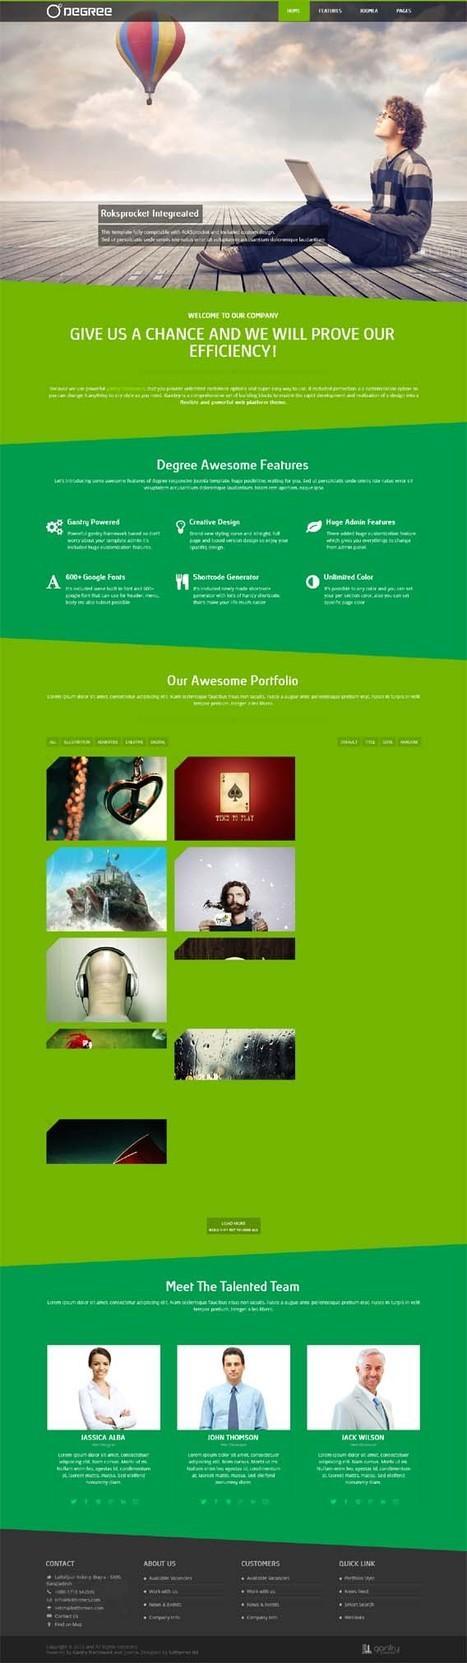 Degree, Joomla Retina Ready Creative Portfolio Template | Premium Download | Premium Joomla Templates Download | Scoop.it